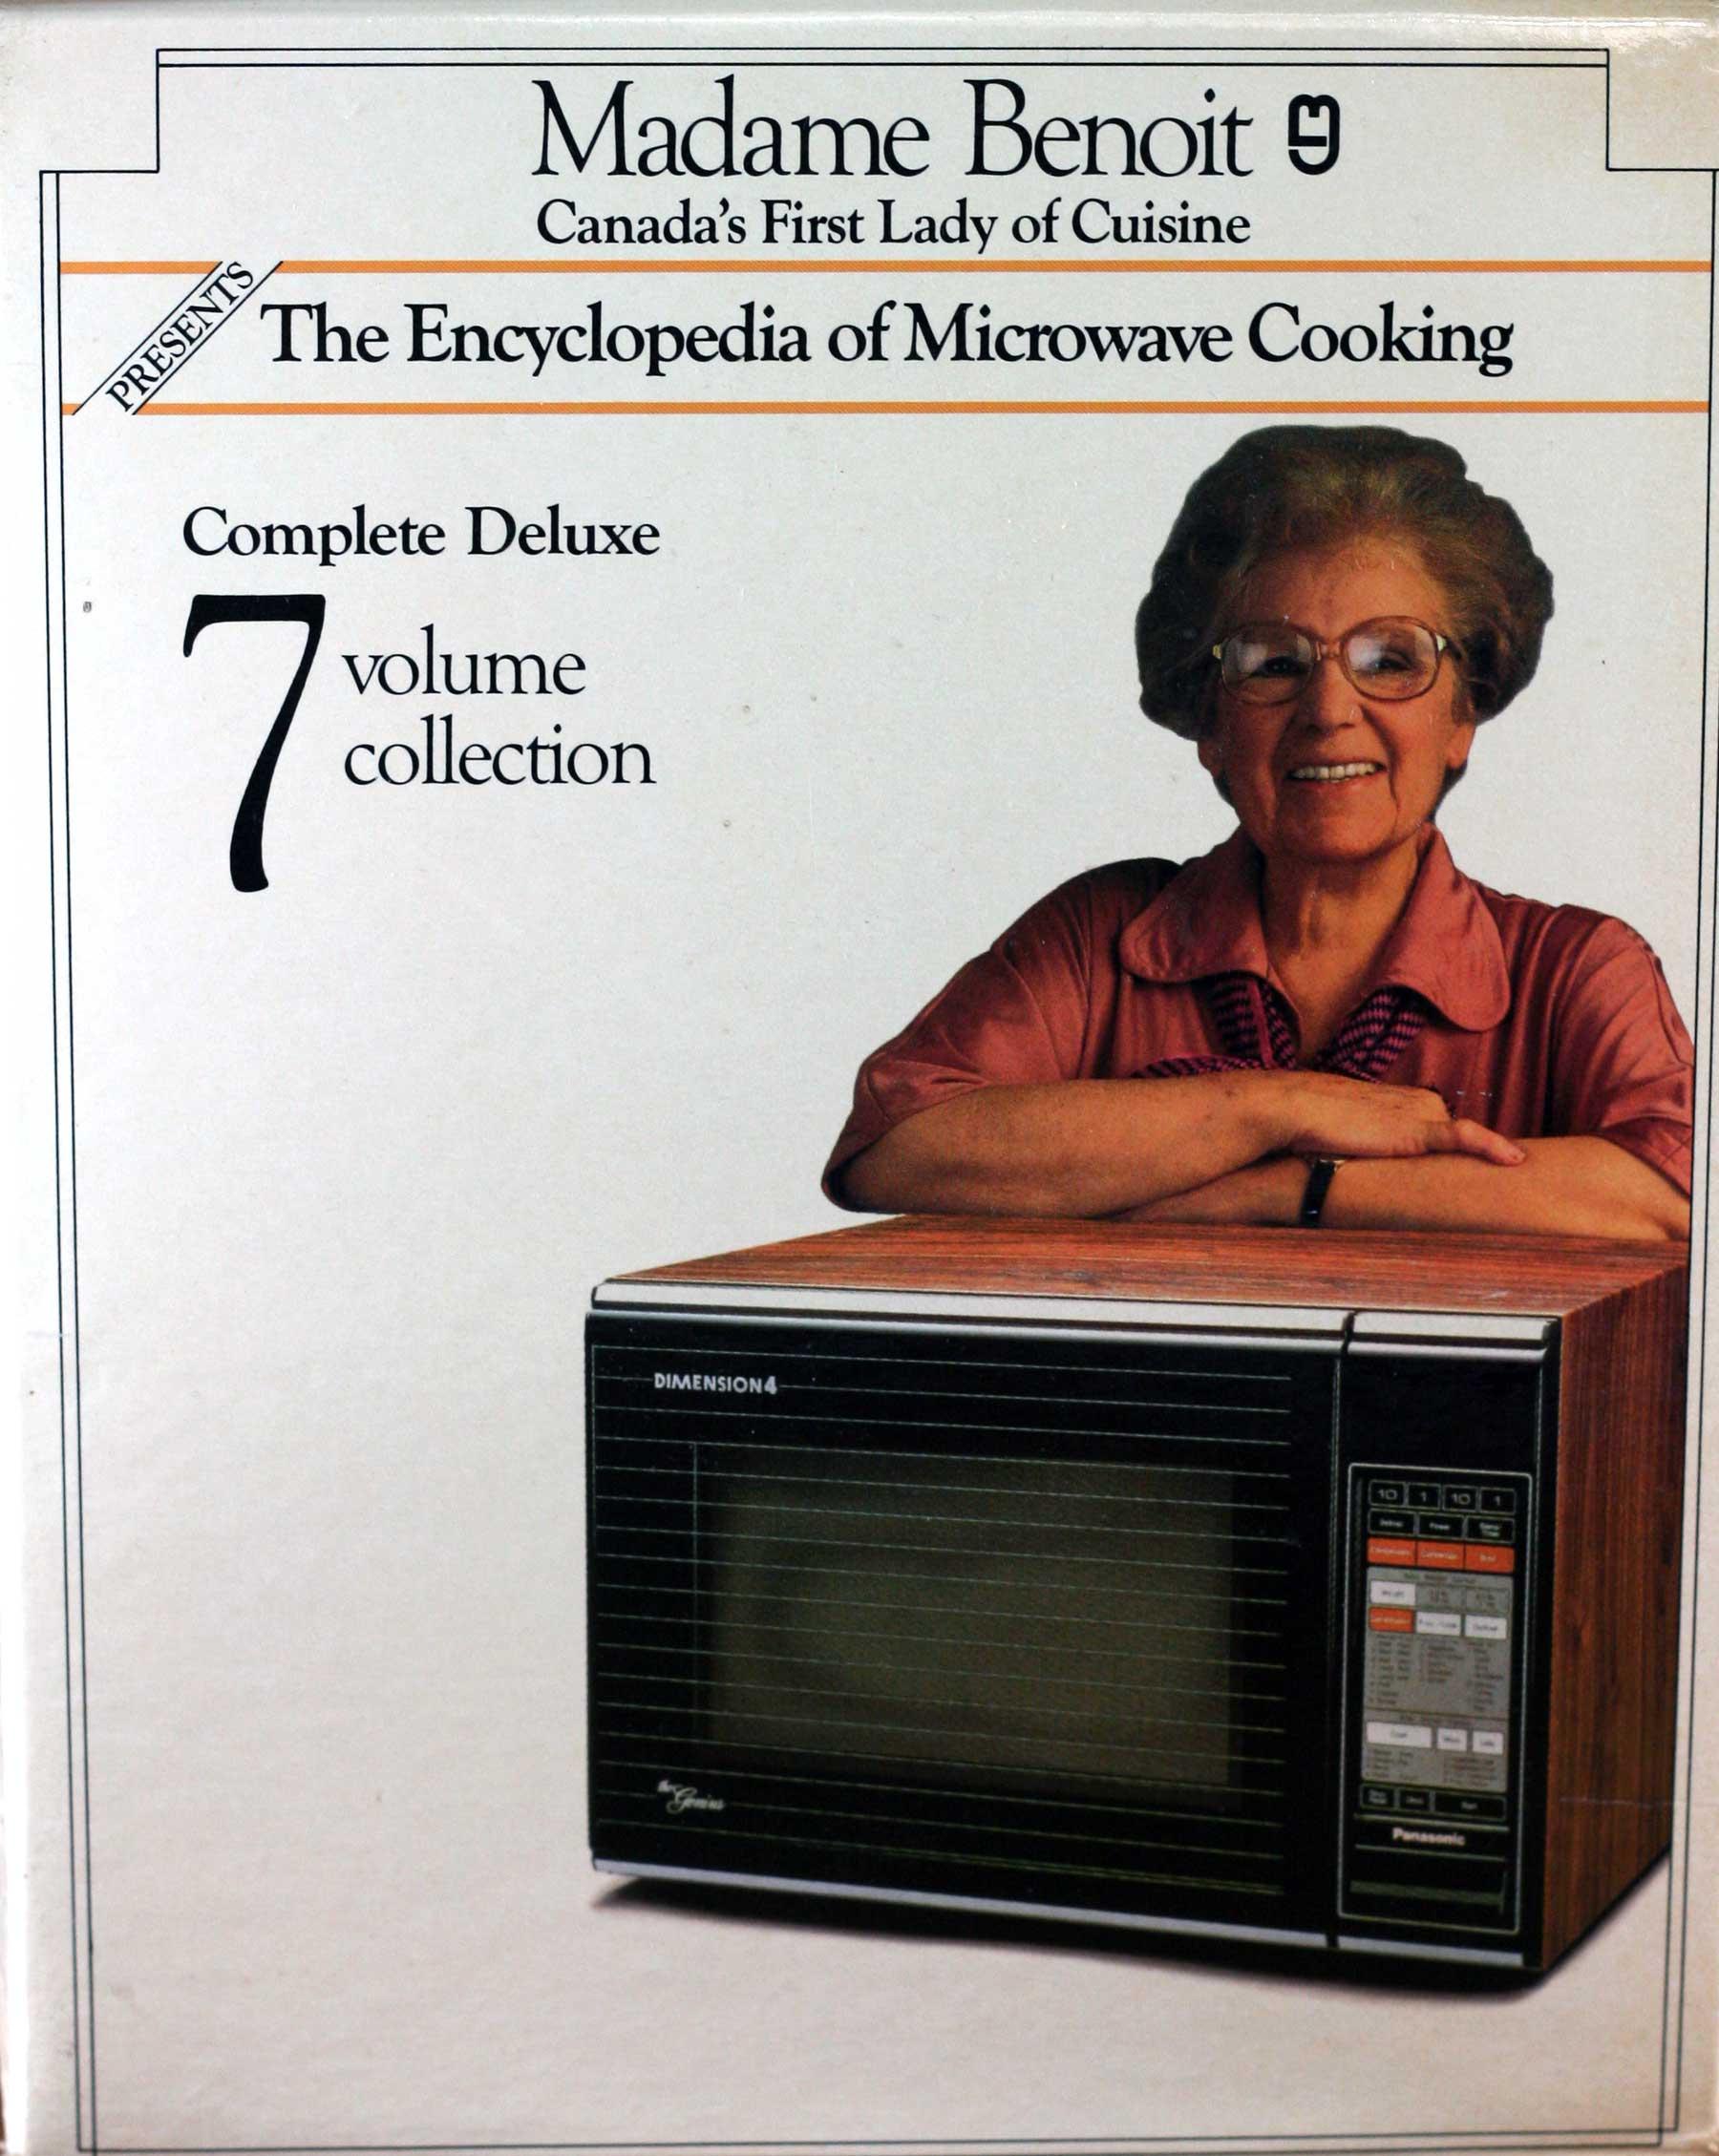 Madame Benoit microwave cooking books